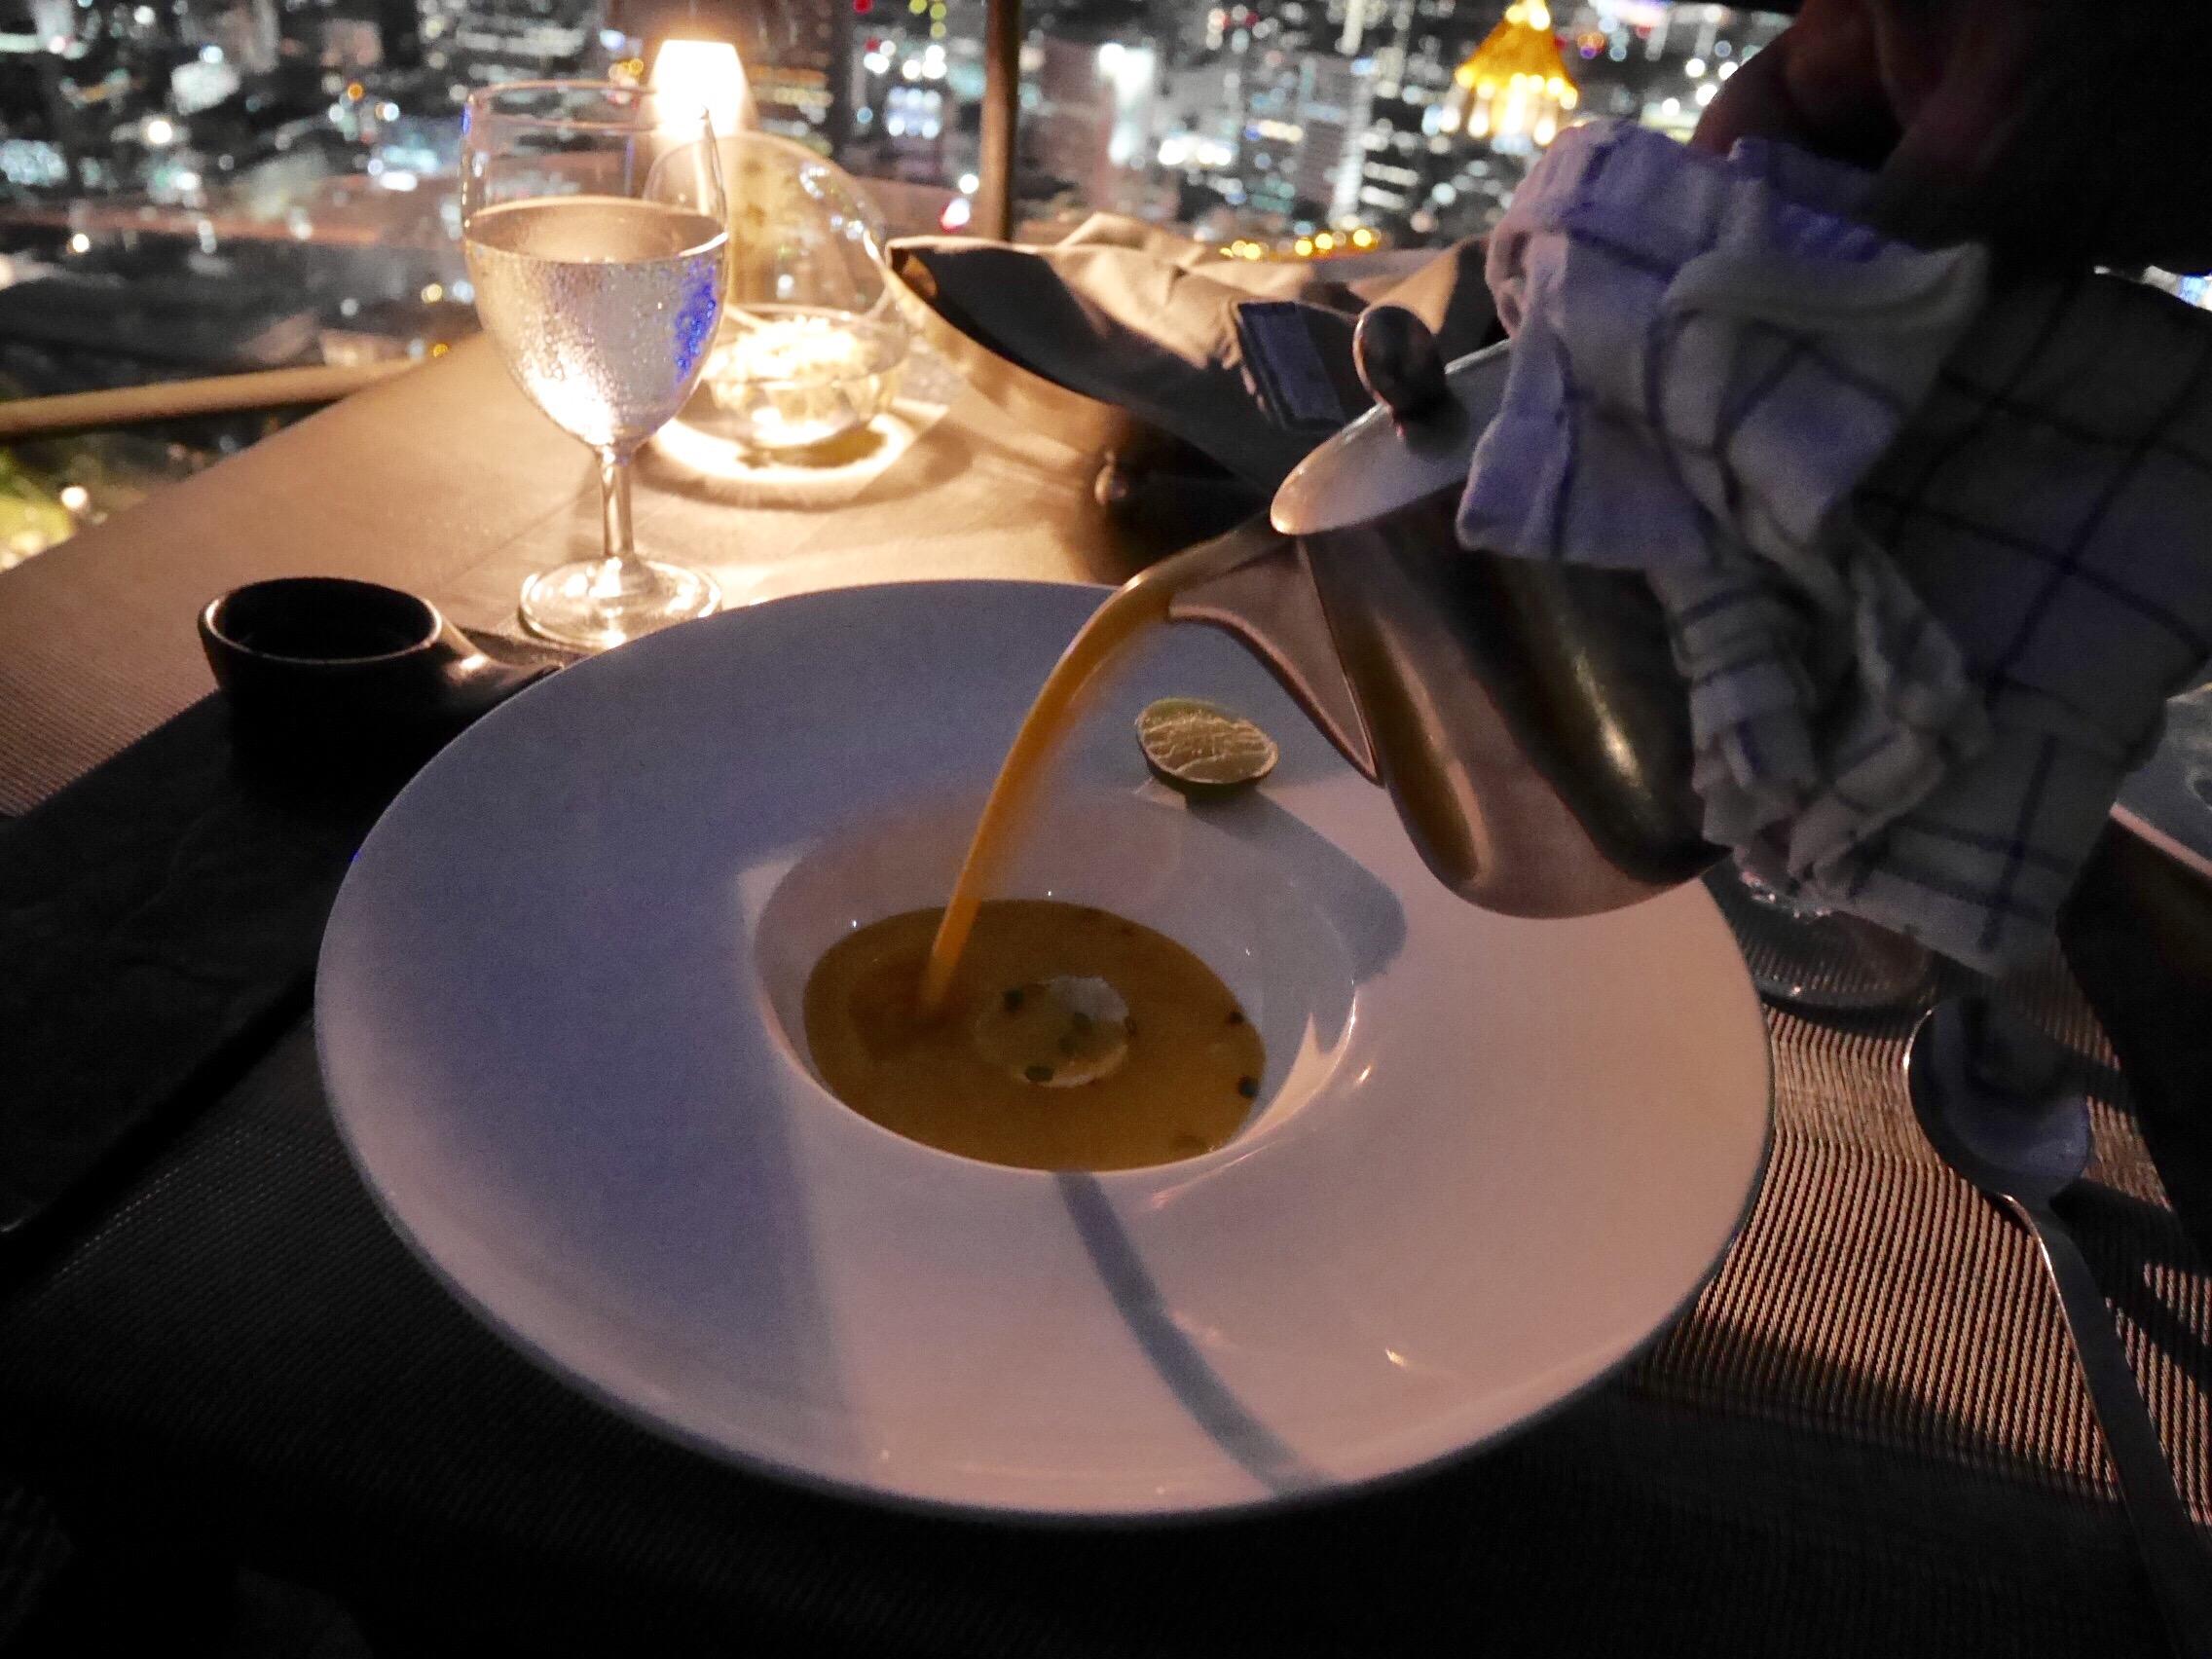 img 8298 - Banyan Tree Bangkok - 61階のルーフトップレストランVertigoで過ごす贅沢ディナータイム